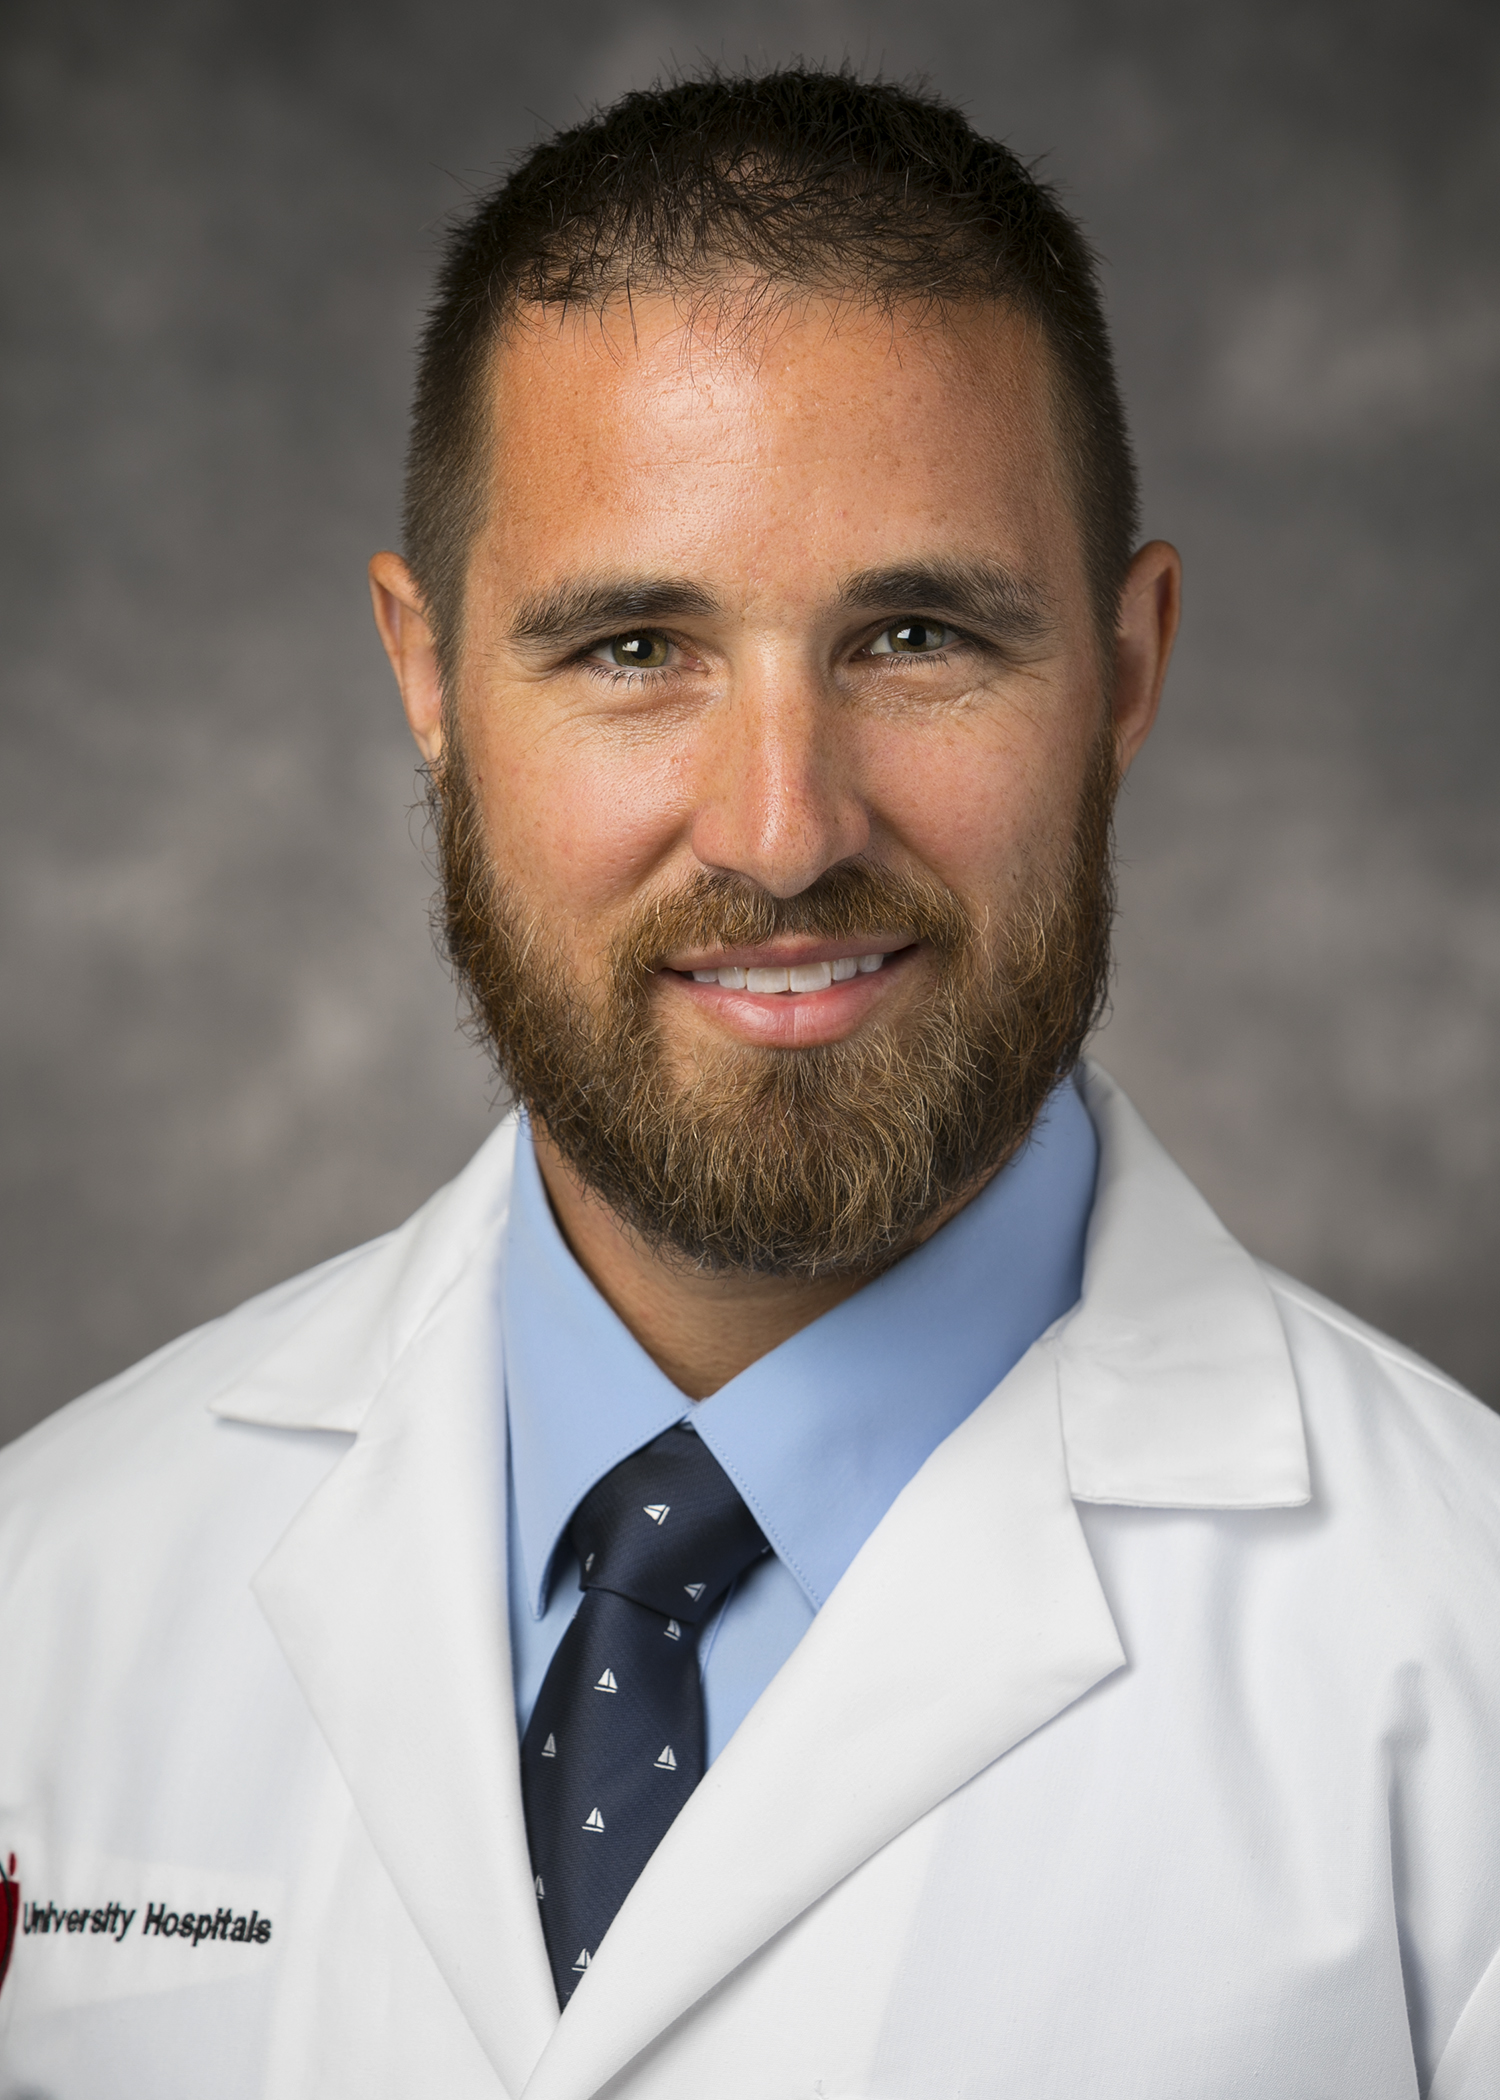 Ryan Juza, MD